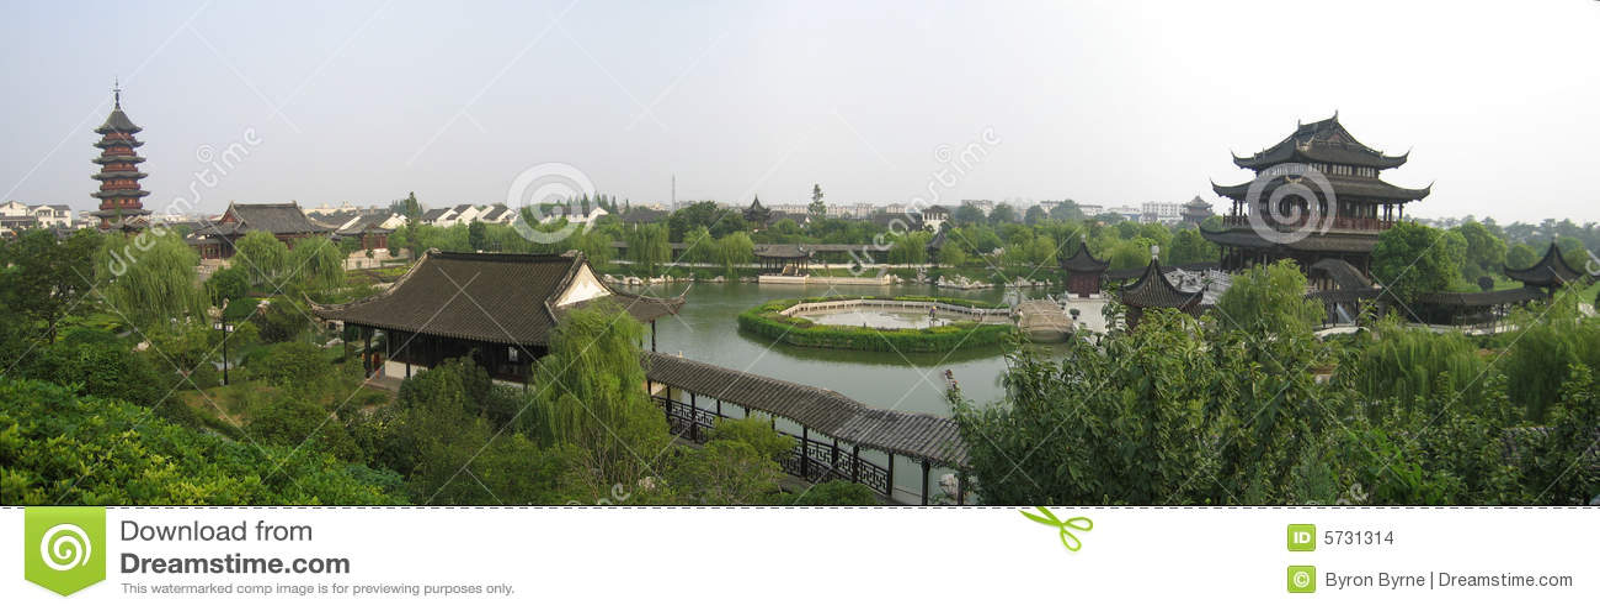 Panorama del giardino di suzhou